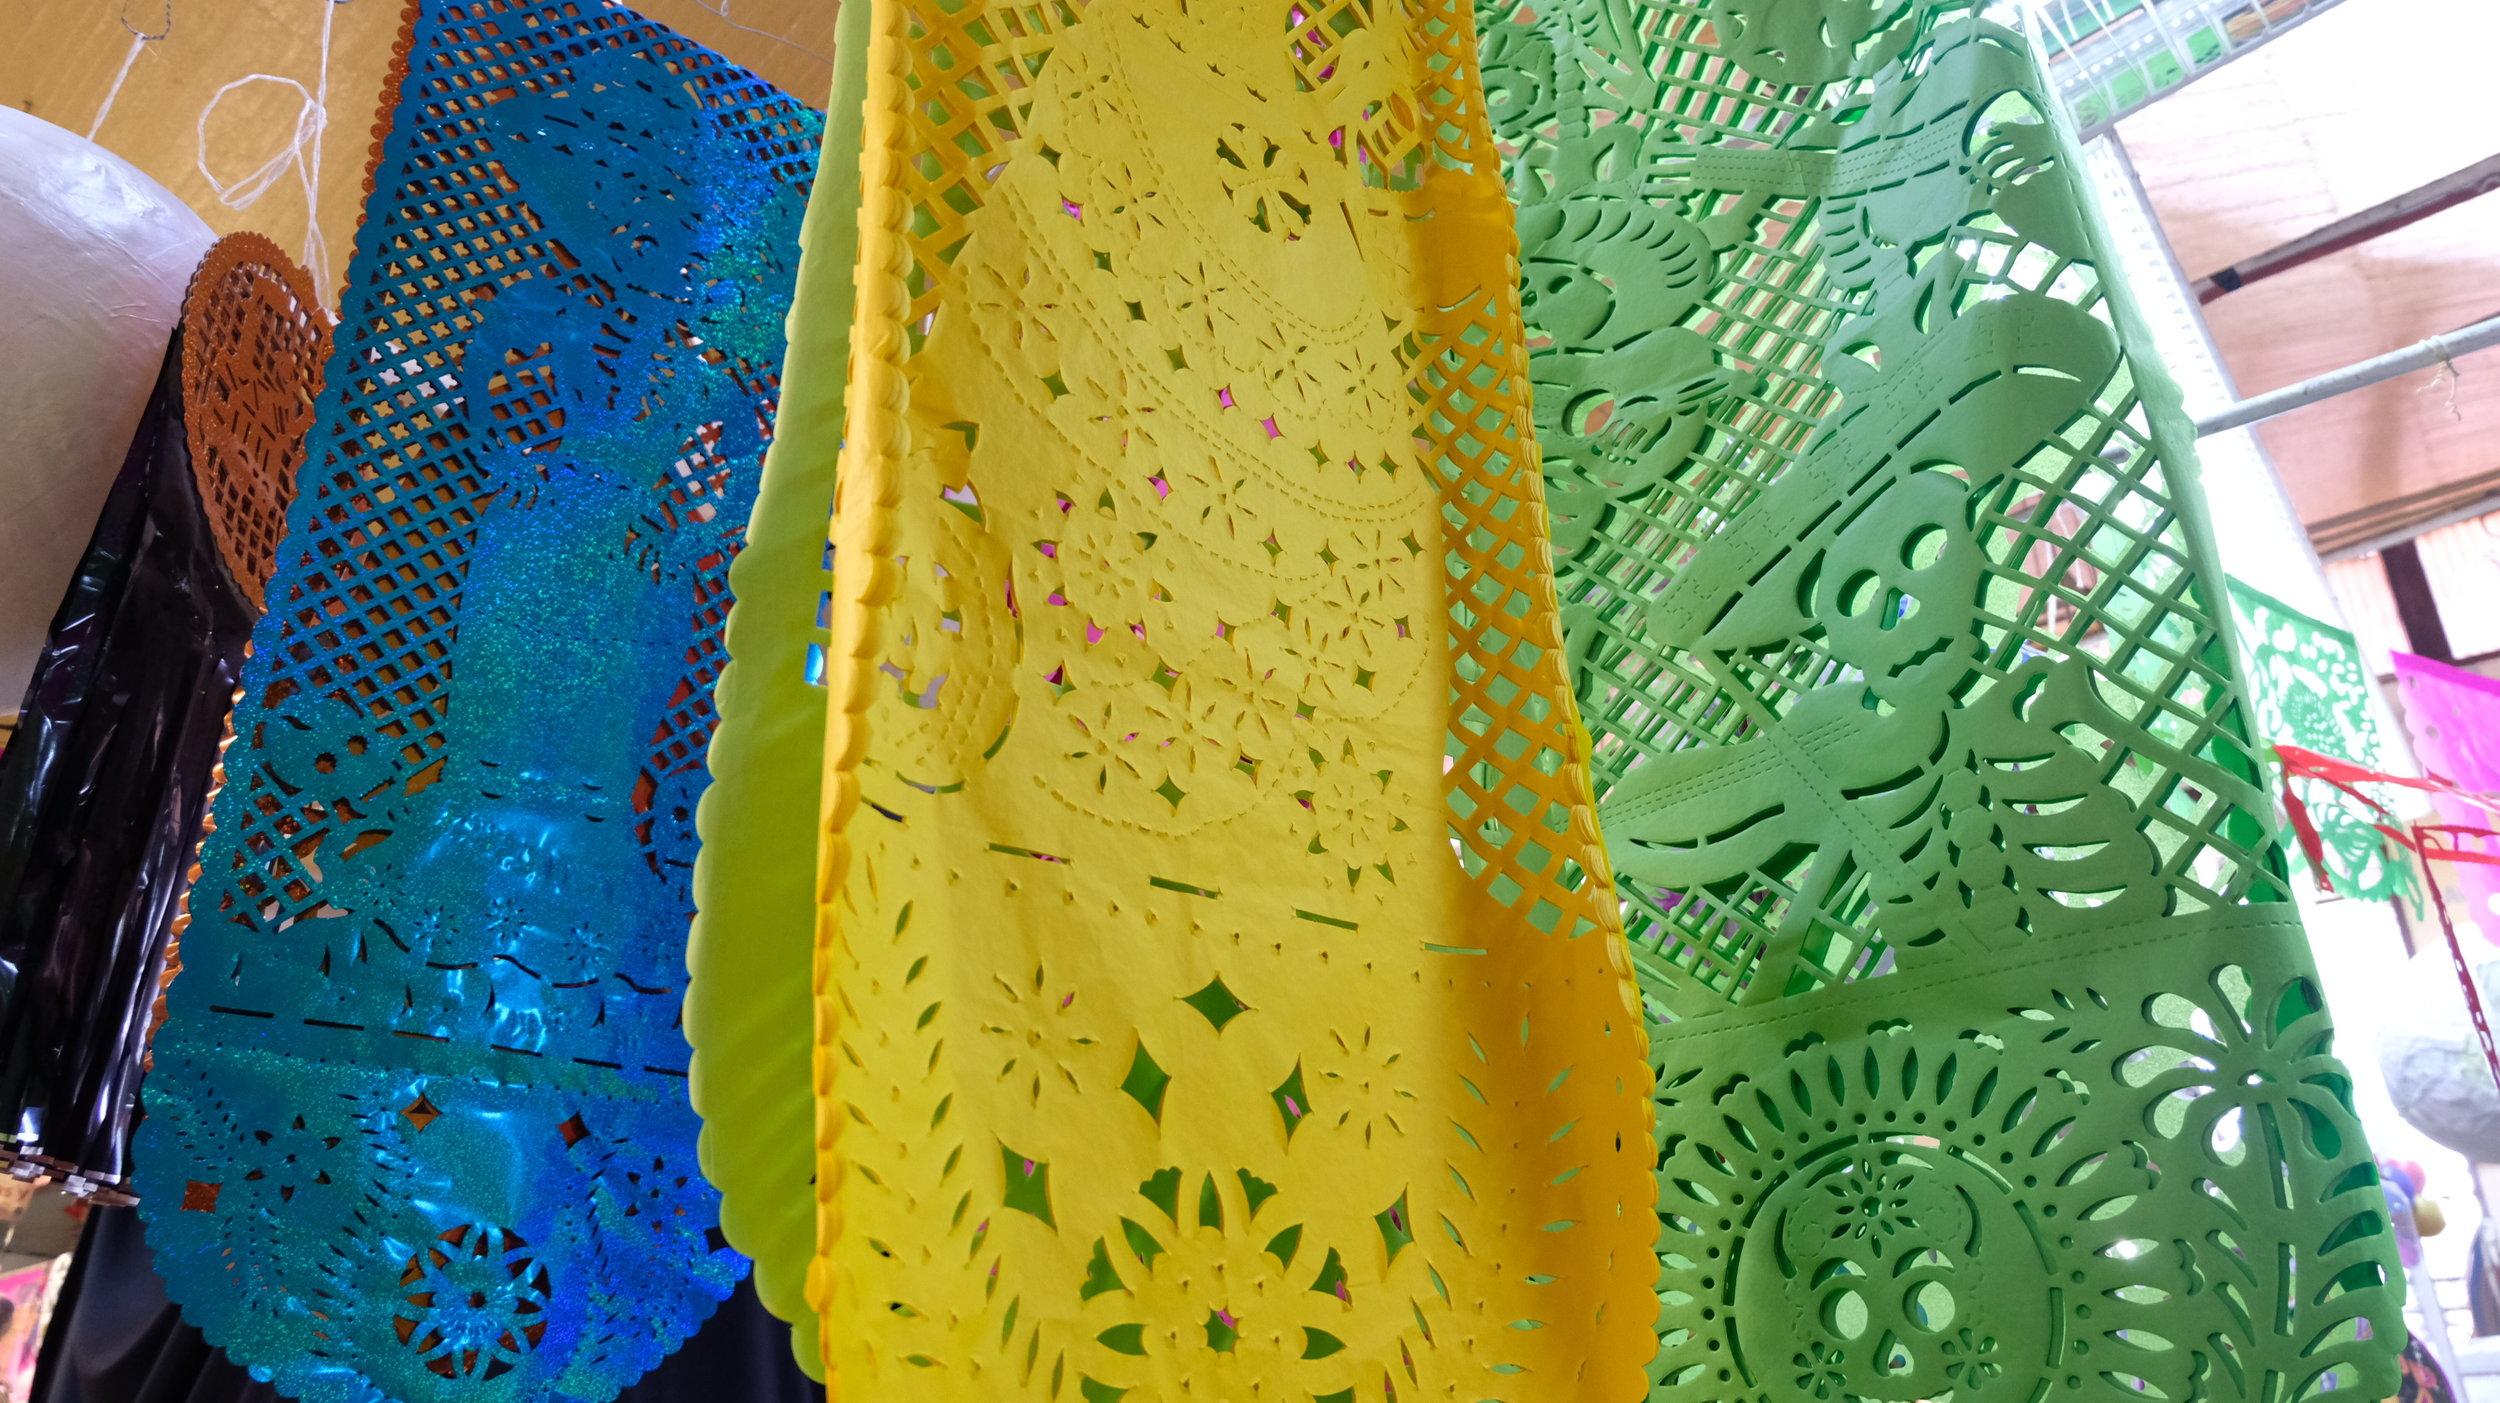 Papel picado (decorative paper)